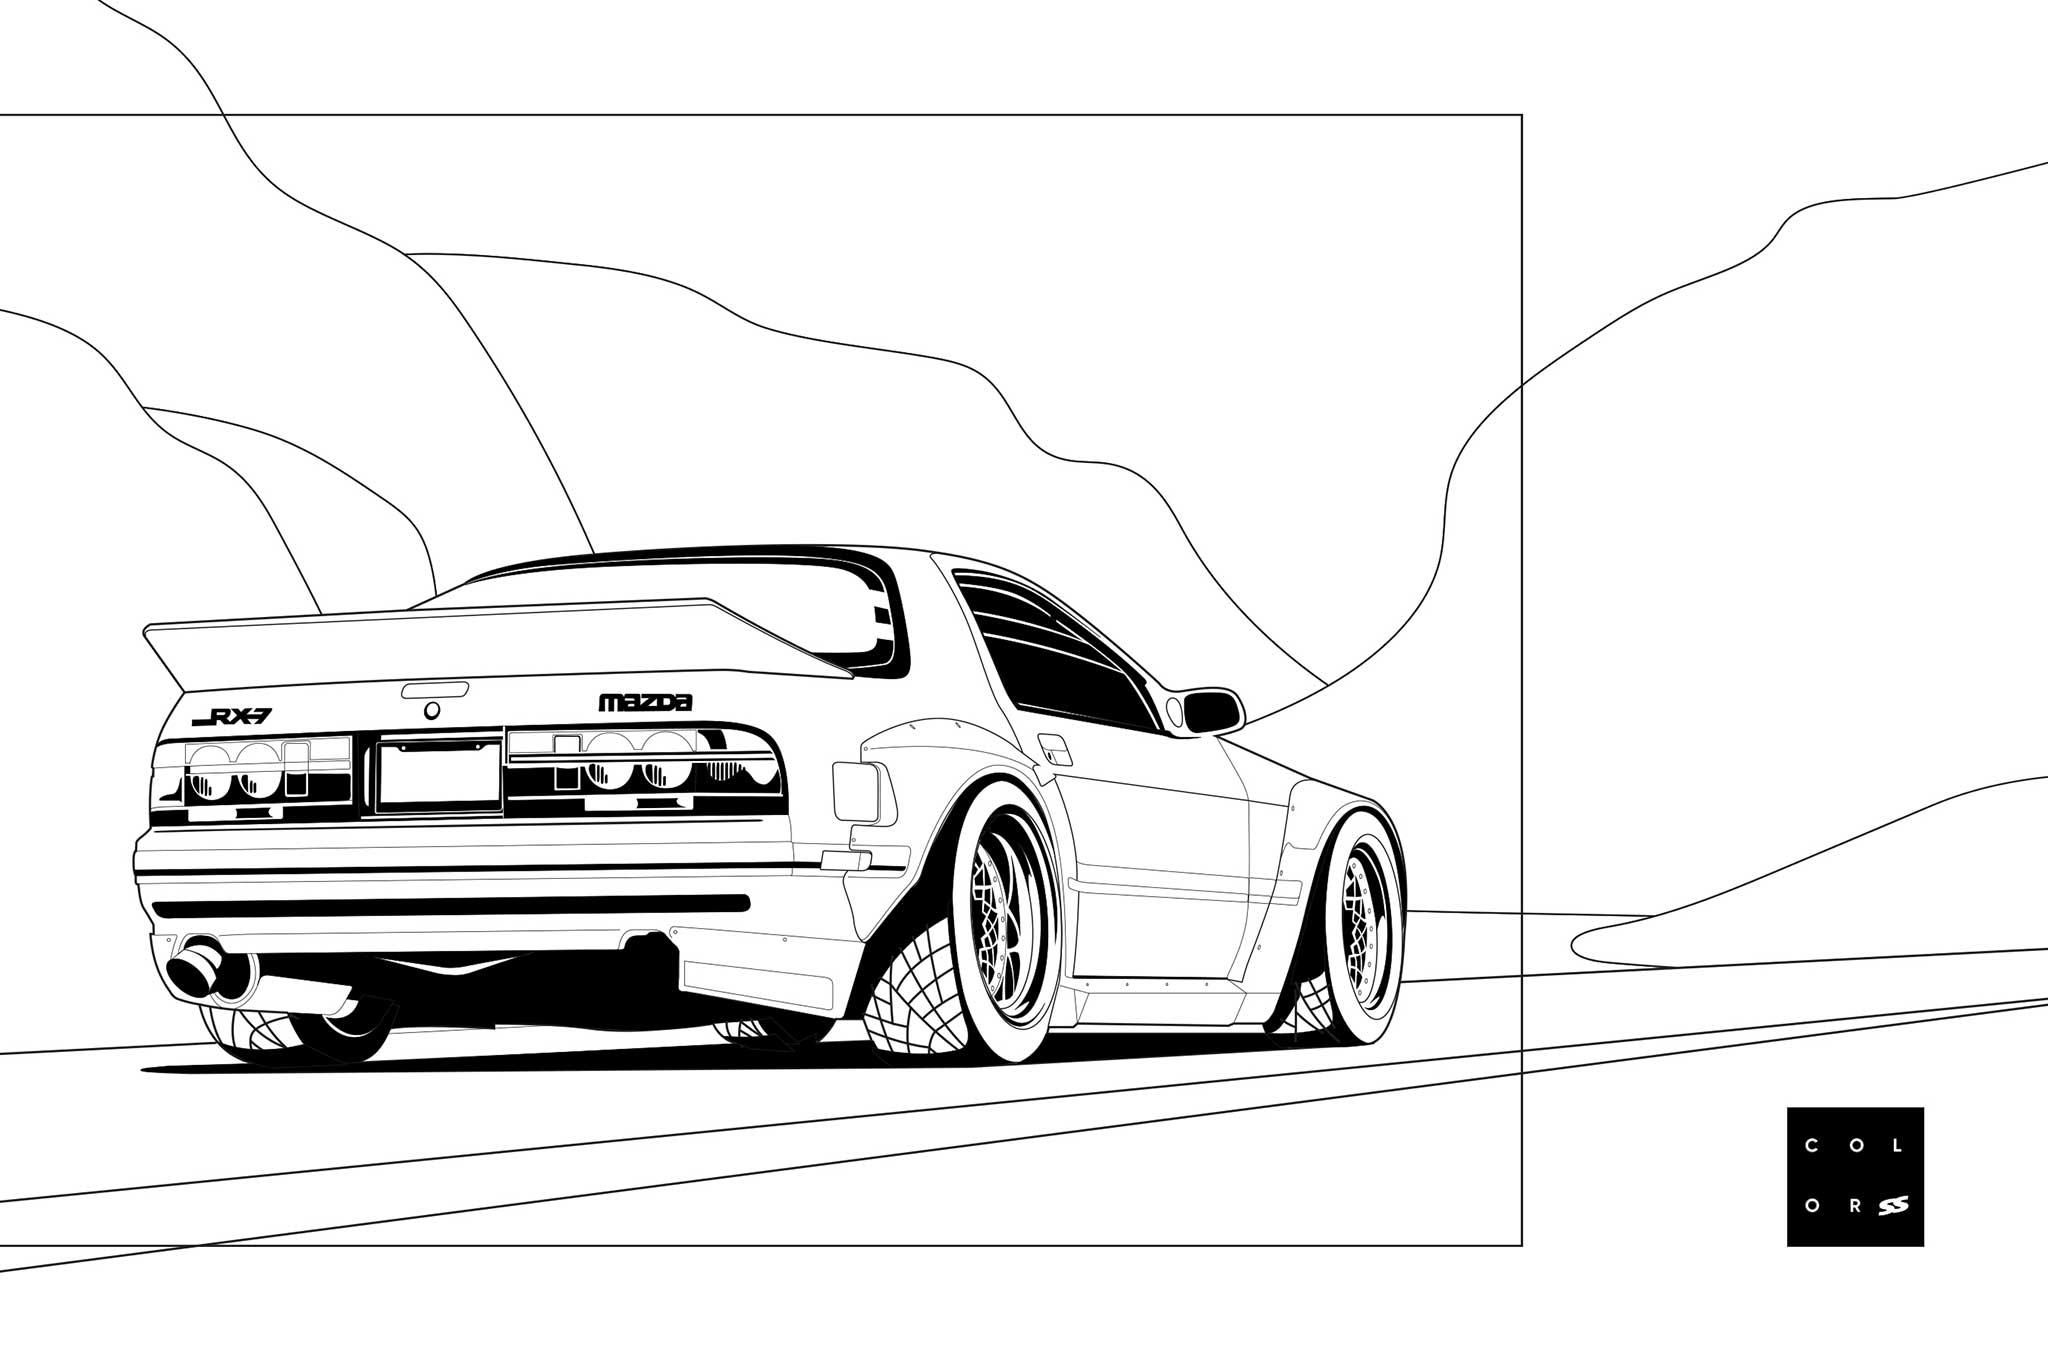 Super Street S Car Coloring Pages V 2